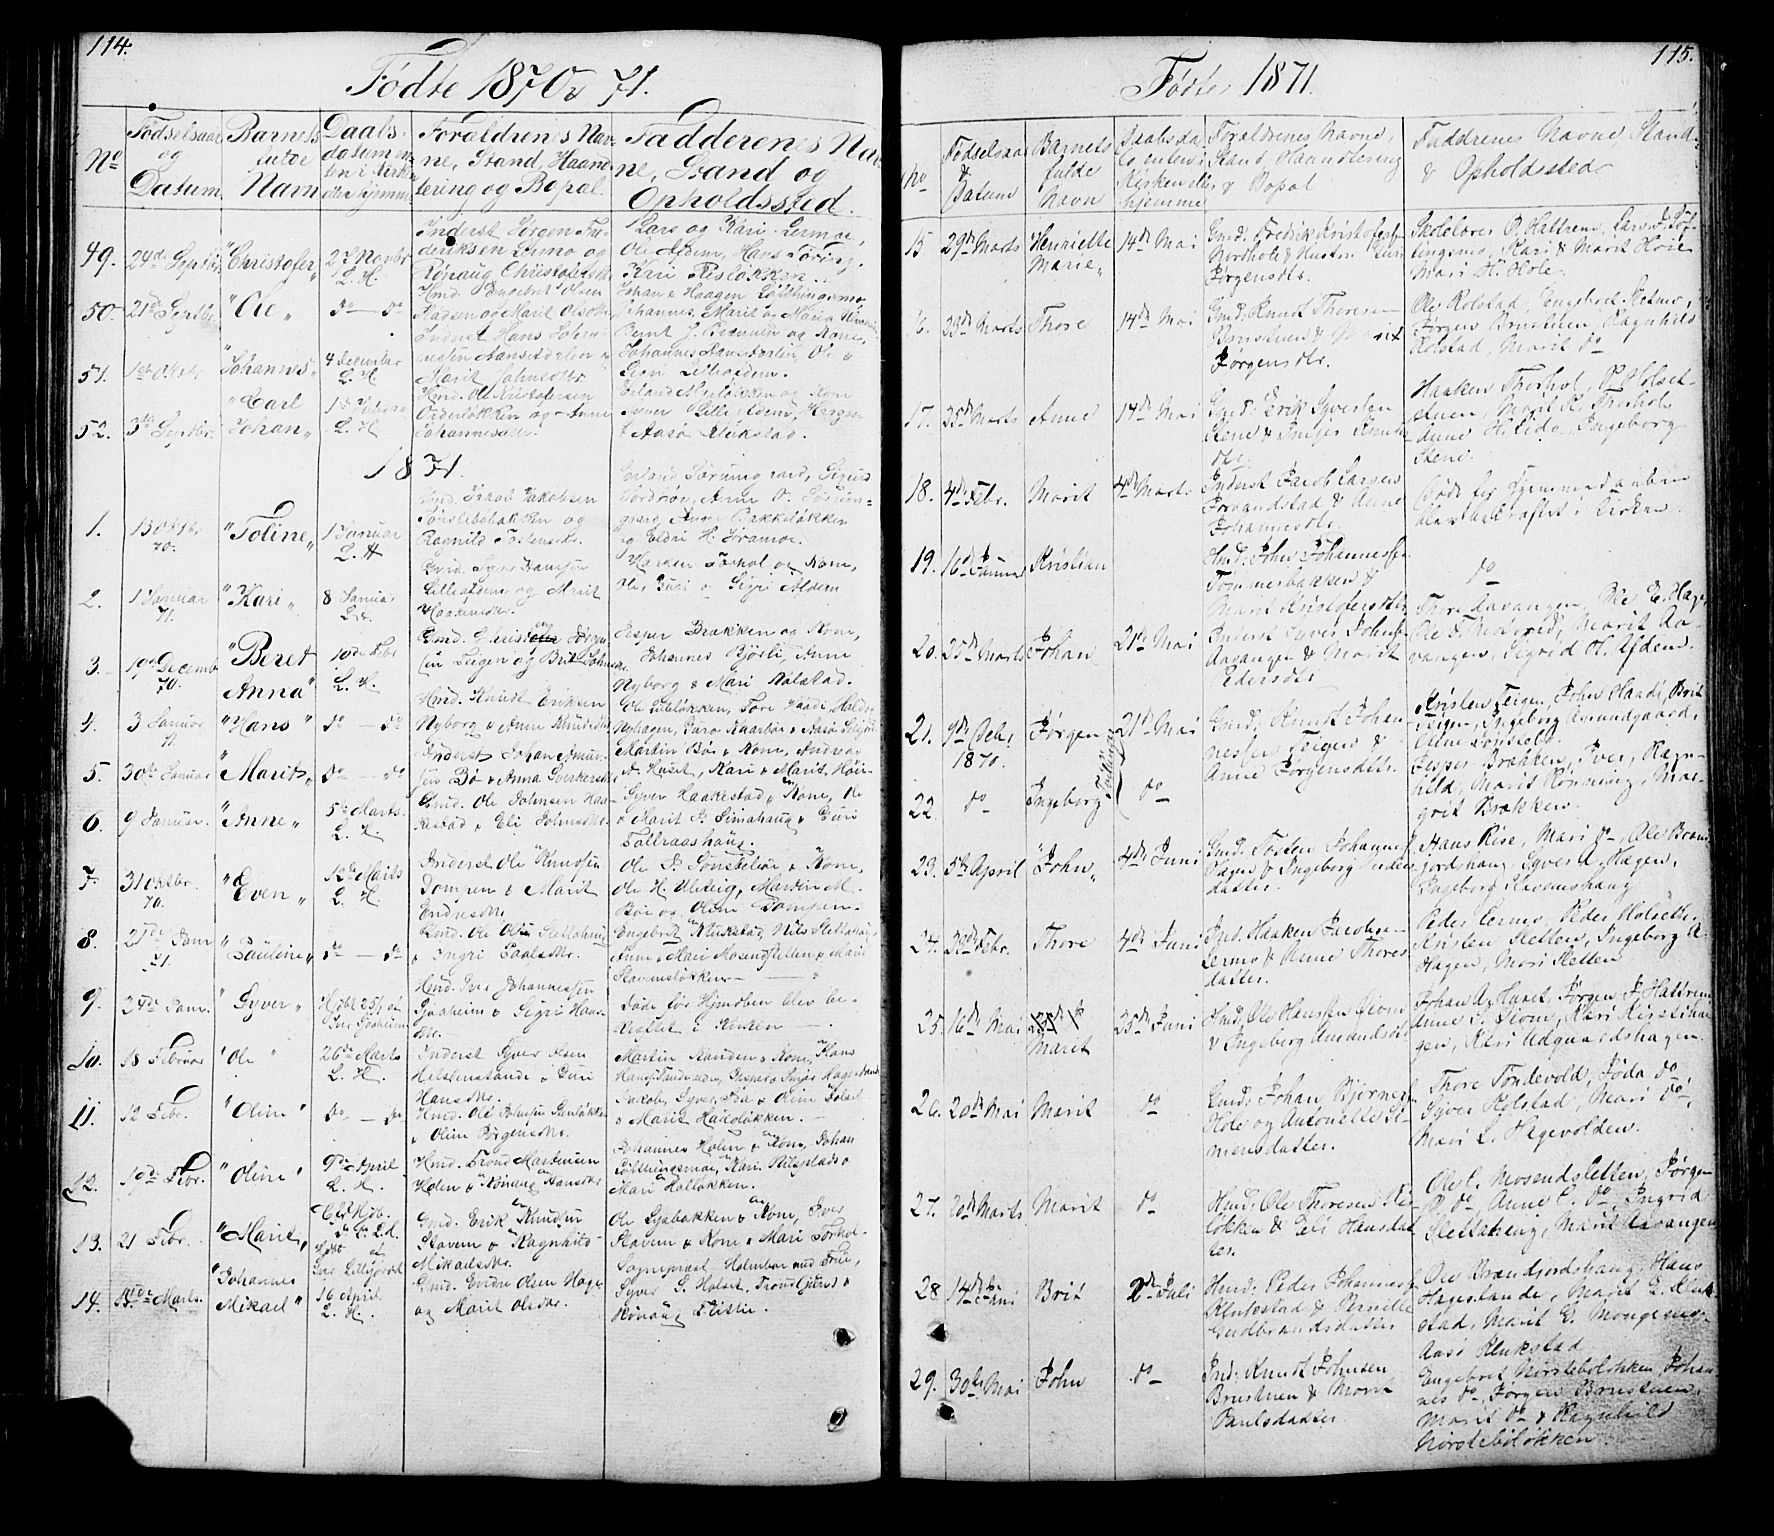 SAH, Lesja prestekontor, Klokkerbok nr. 5, 1850-1894, s. 114-115